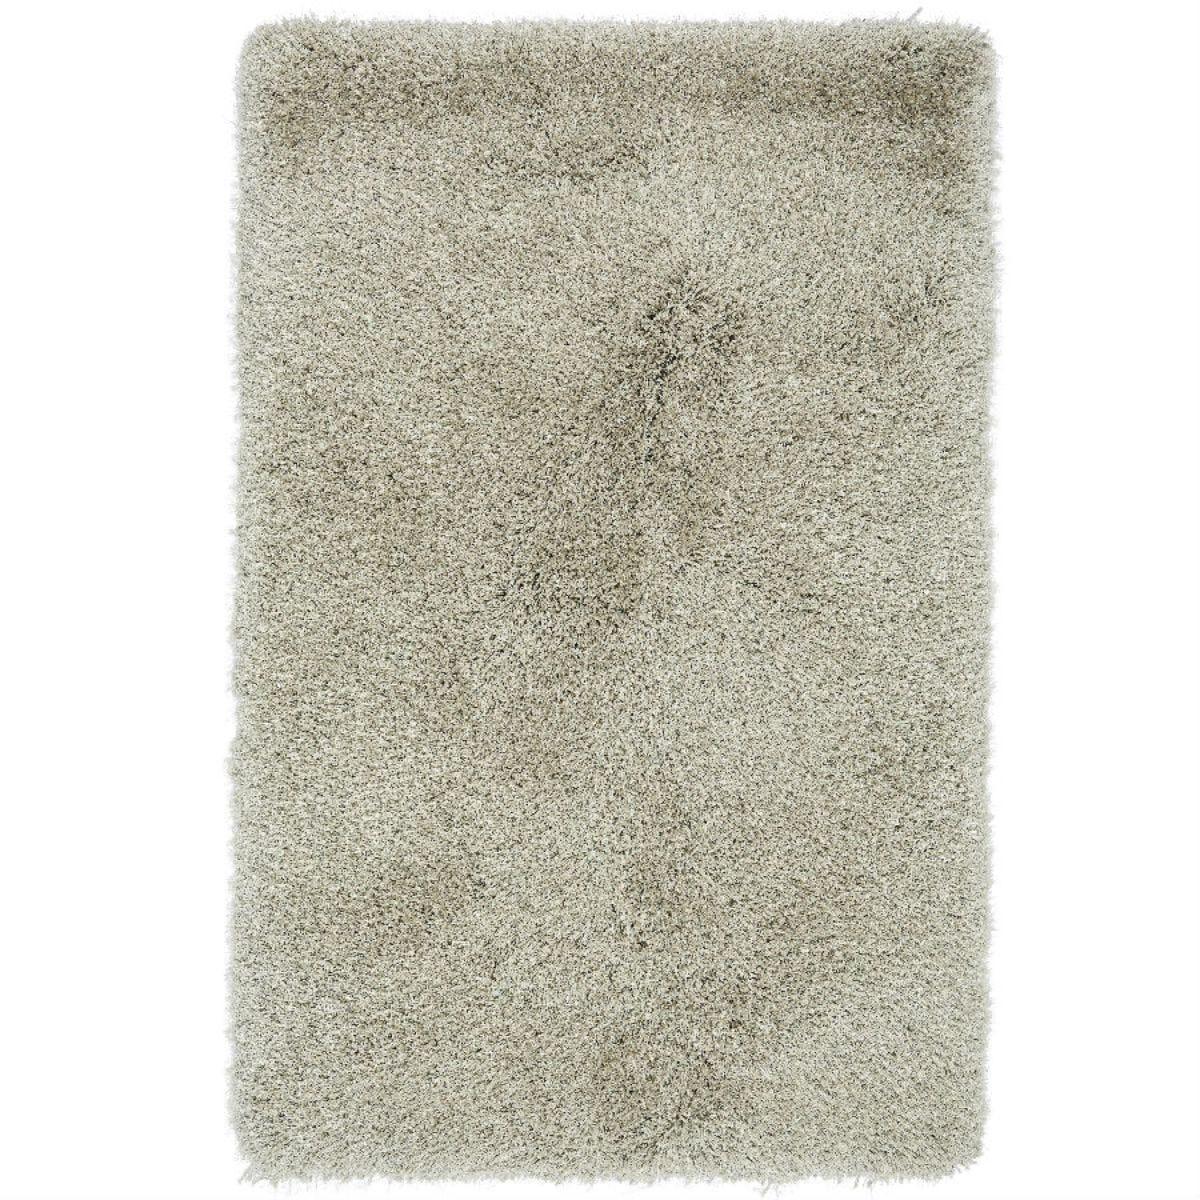 Asiatic Cascade Rug, 230 x 160cm - Sand